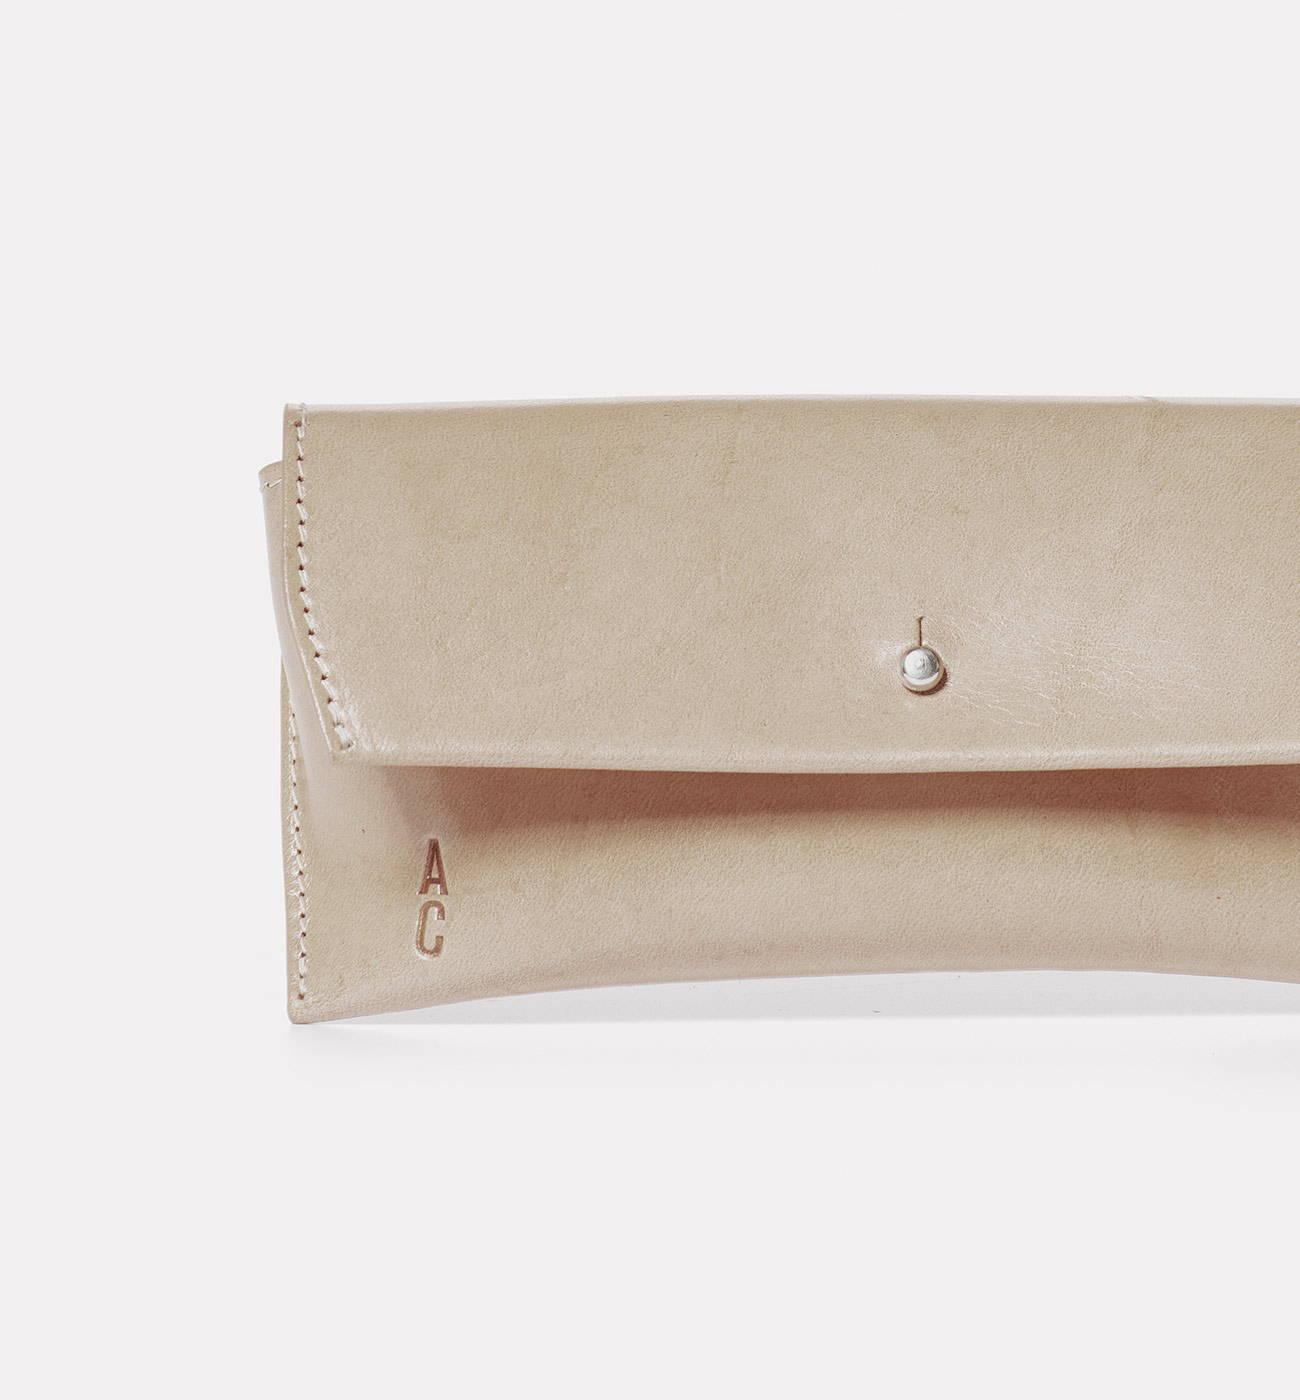 Kit Leather Glasses Case in Grey